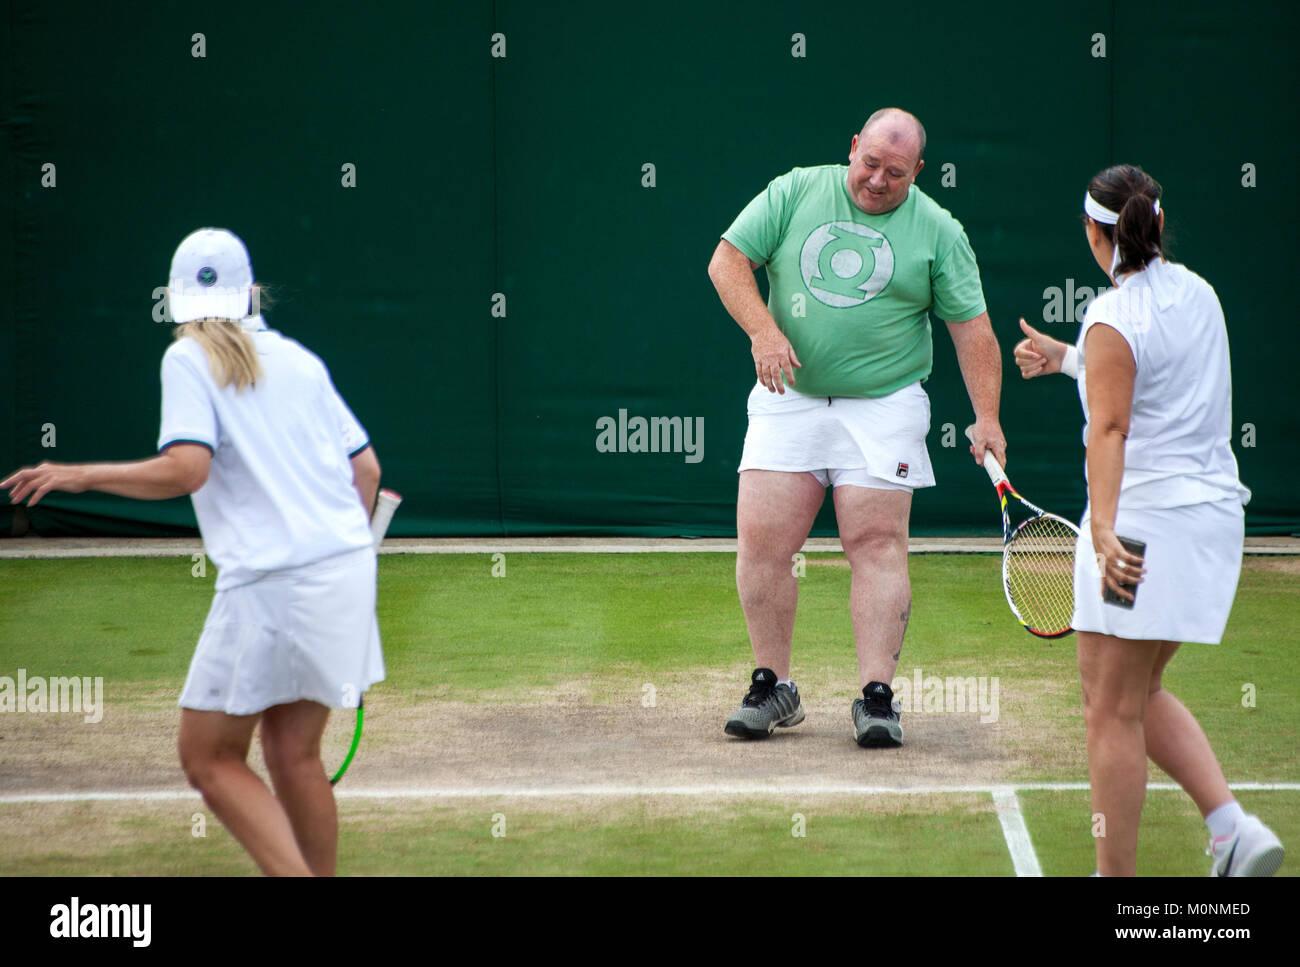 Wimbledon 2017 ladies invitational double fun on court - Stock Image